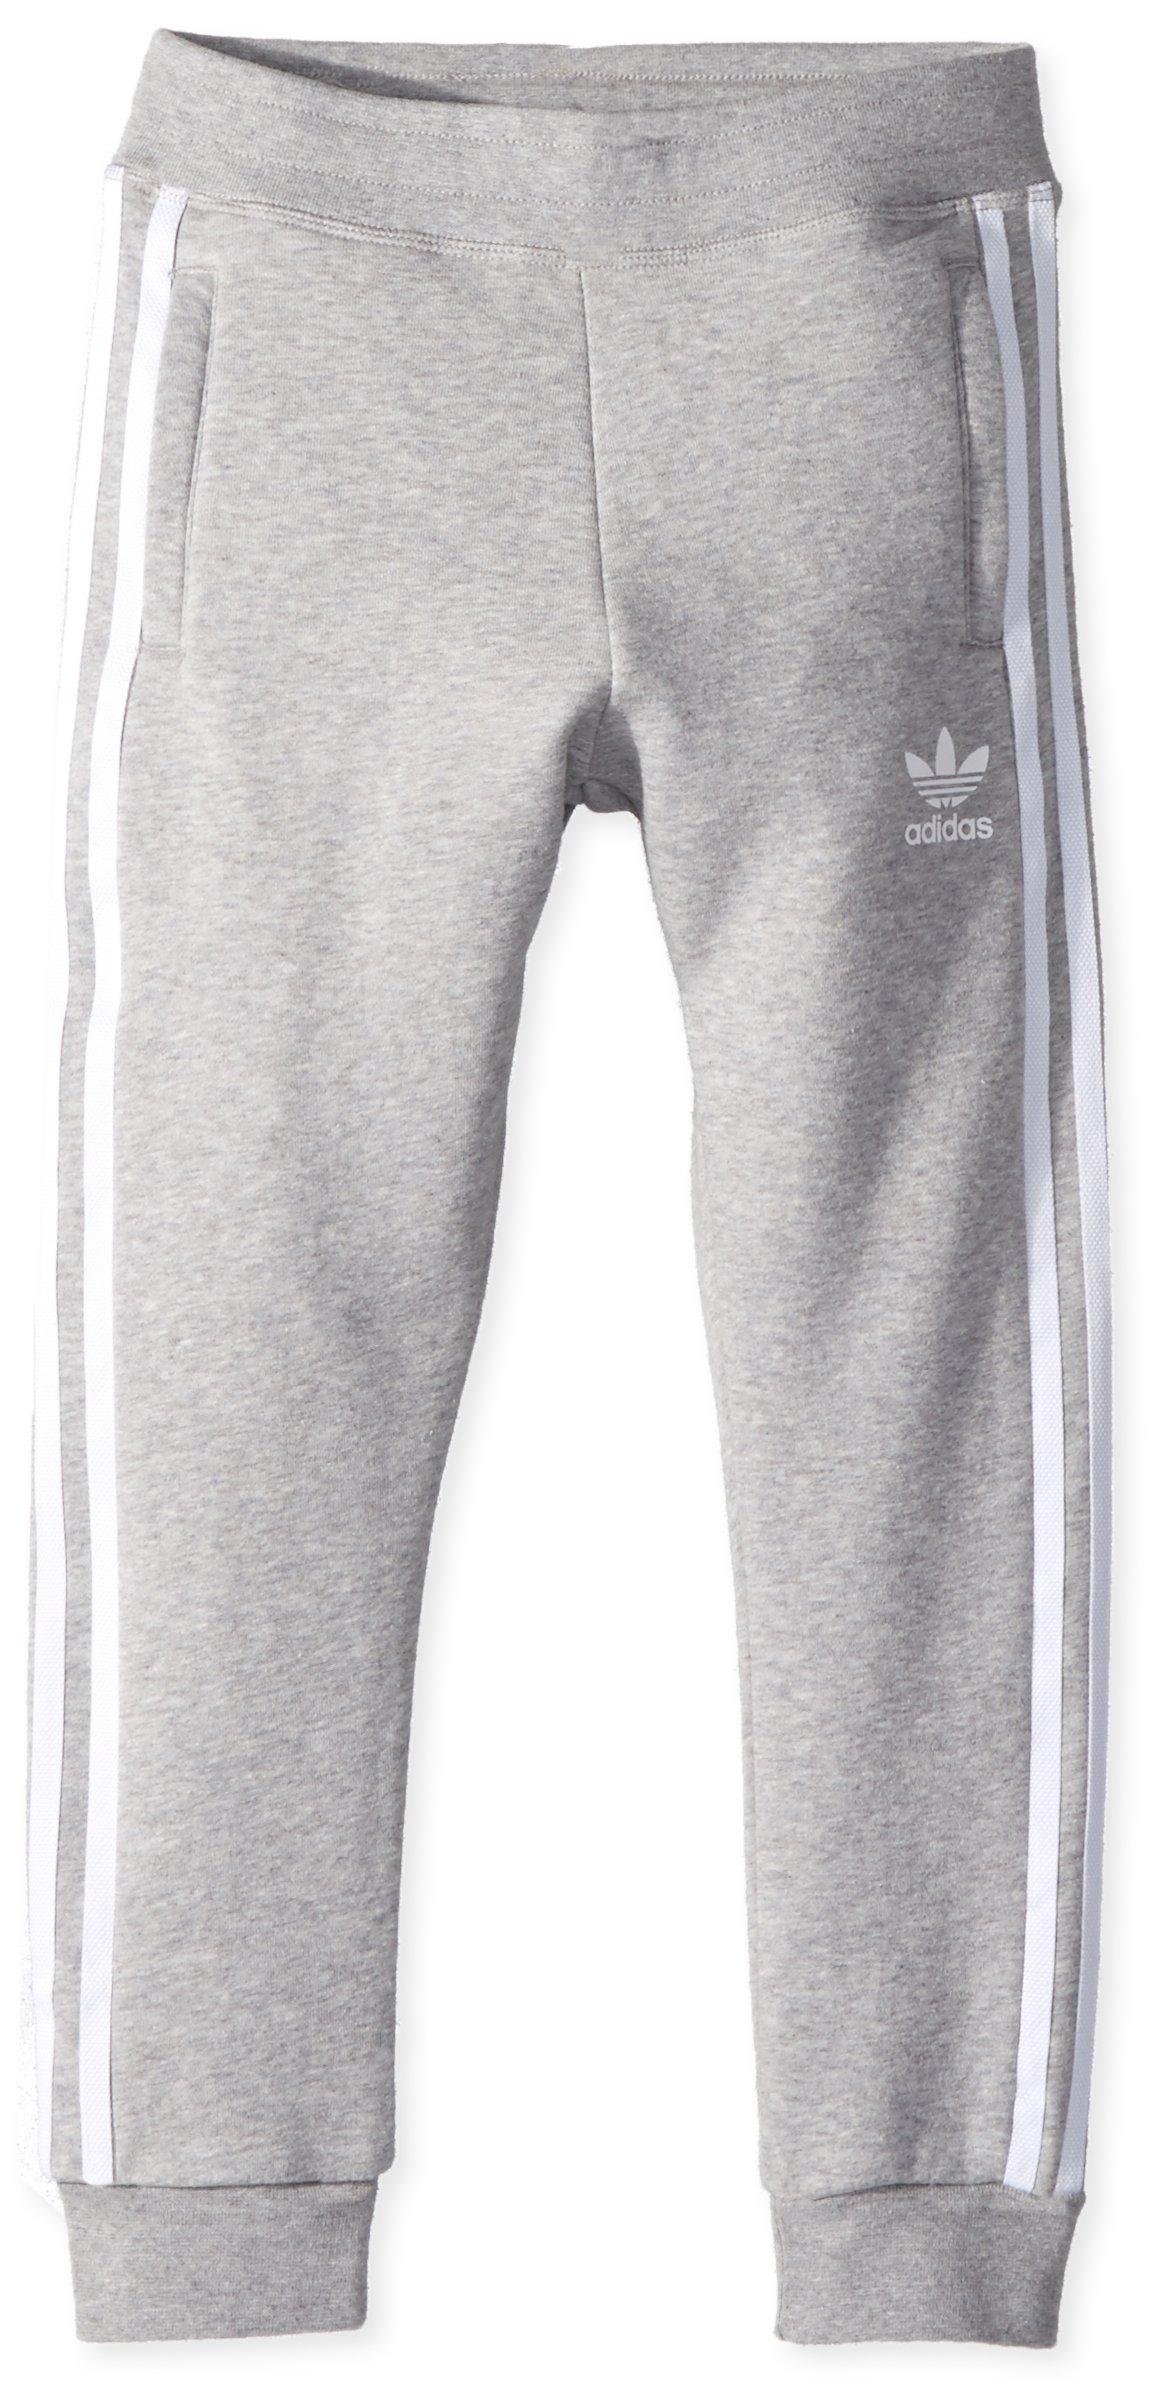 adidas Originals Boys' Little Trefoil Pants, Medium Grey Heather/White, XS